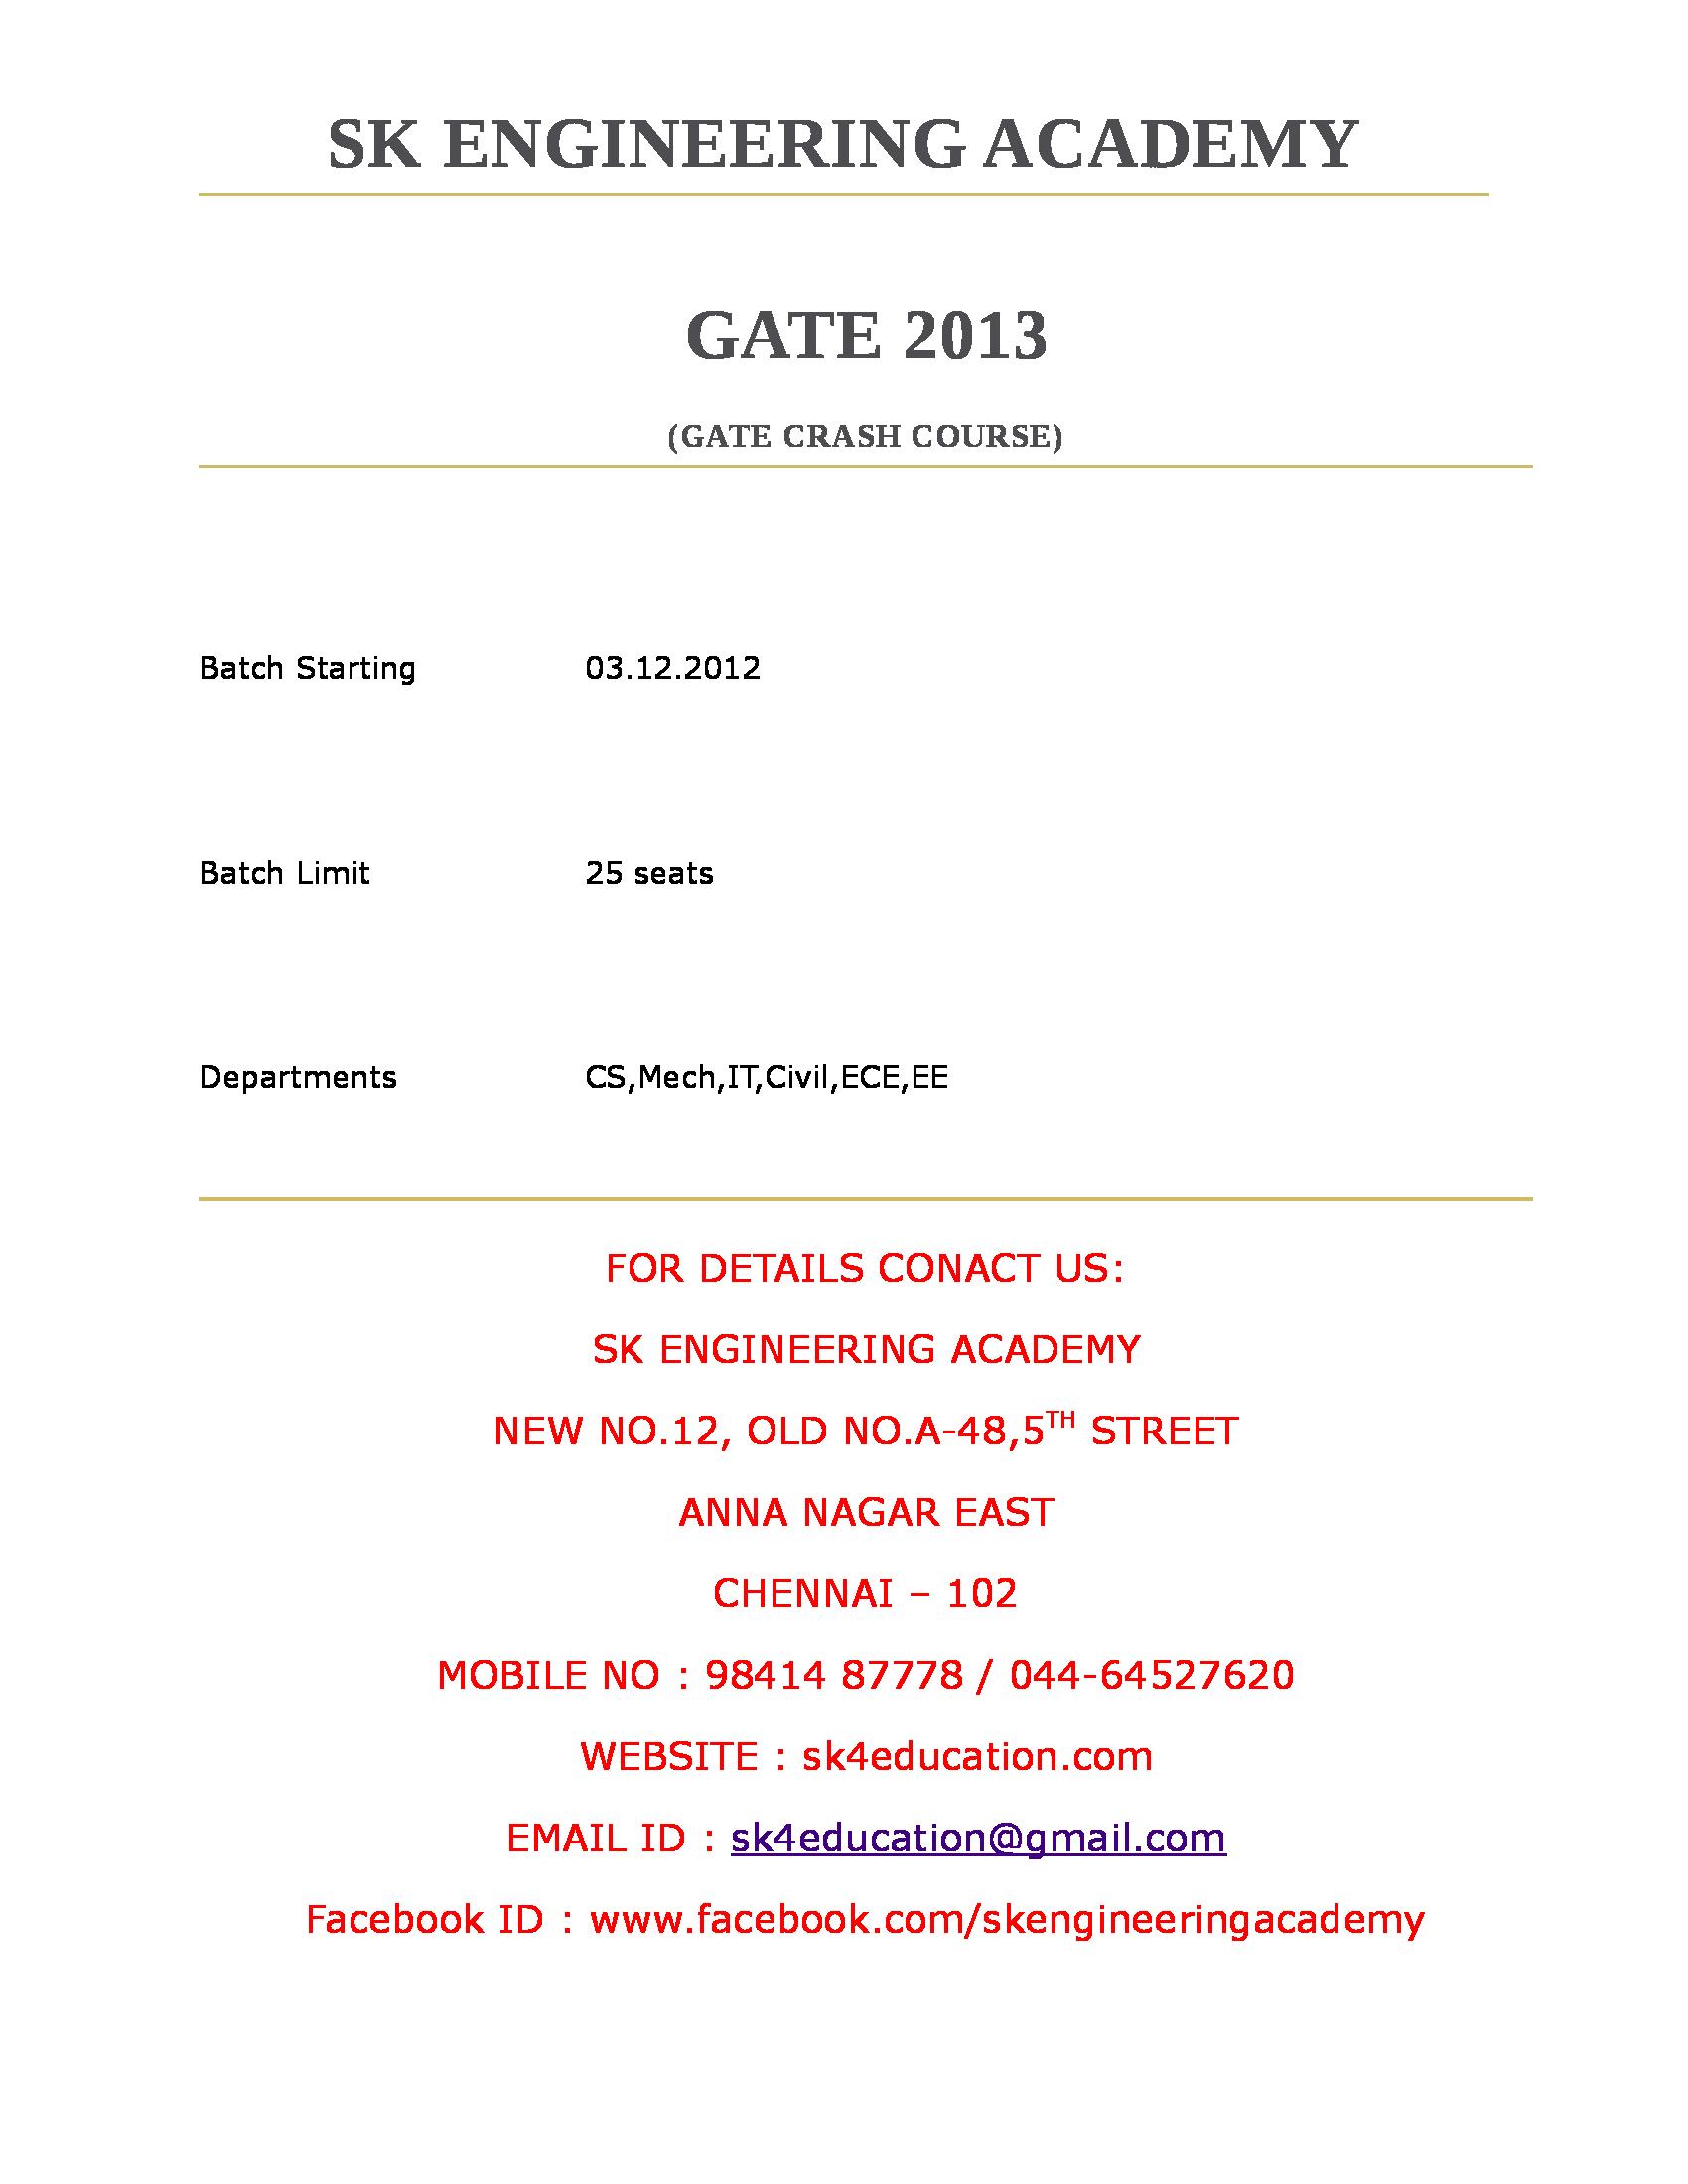 Gate coaching crash course in bangalore dating 2